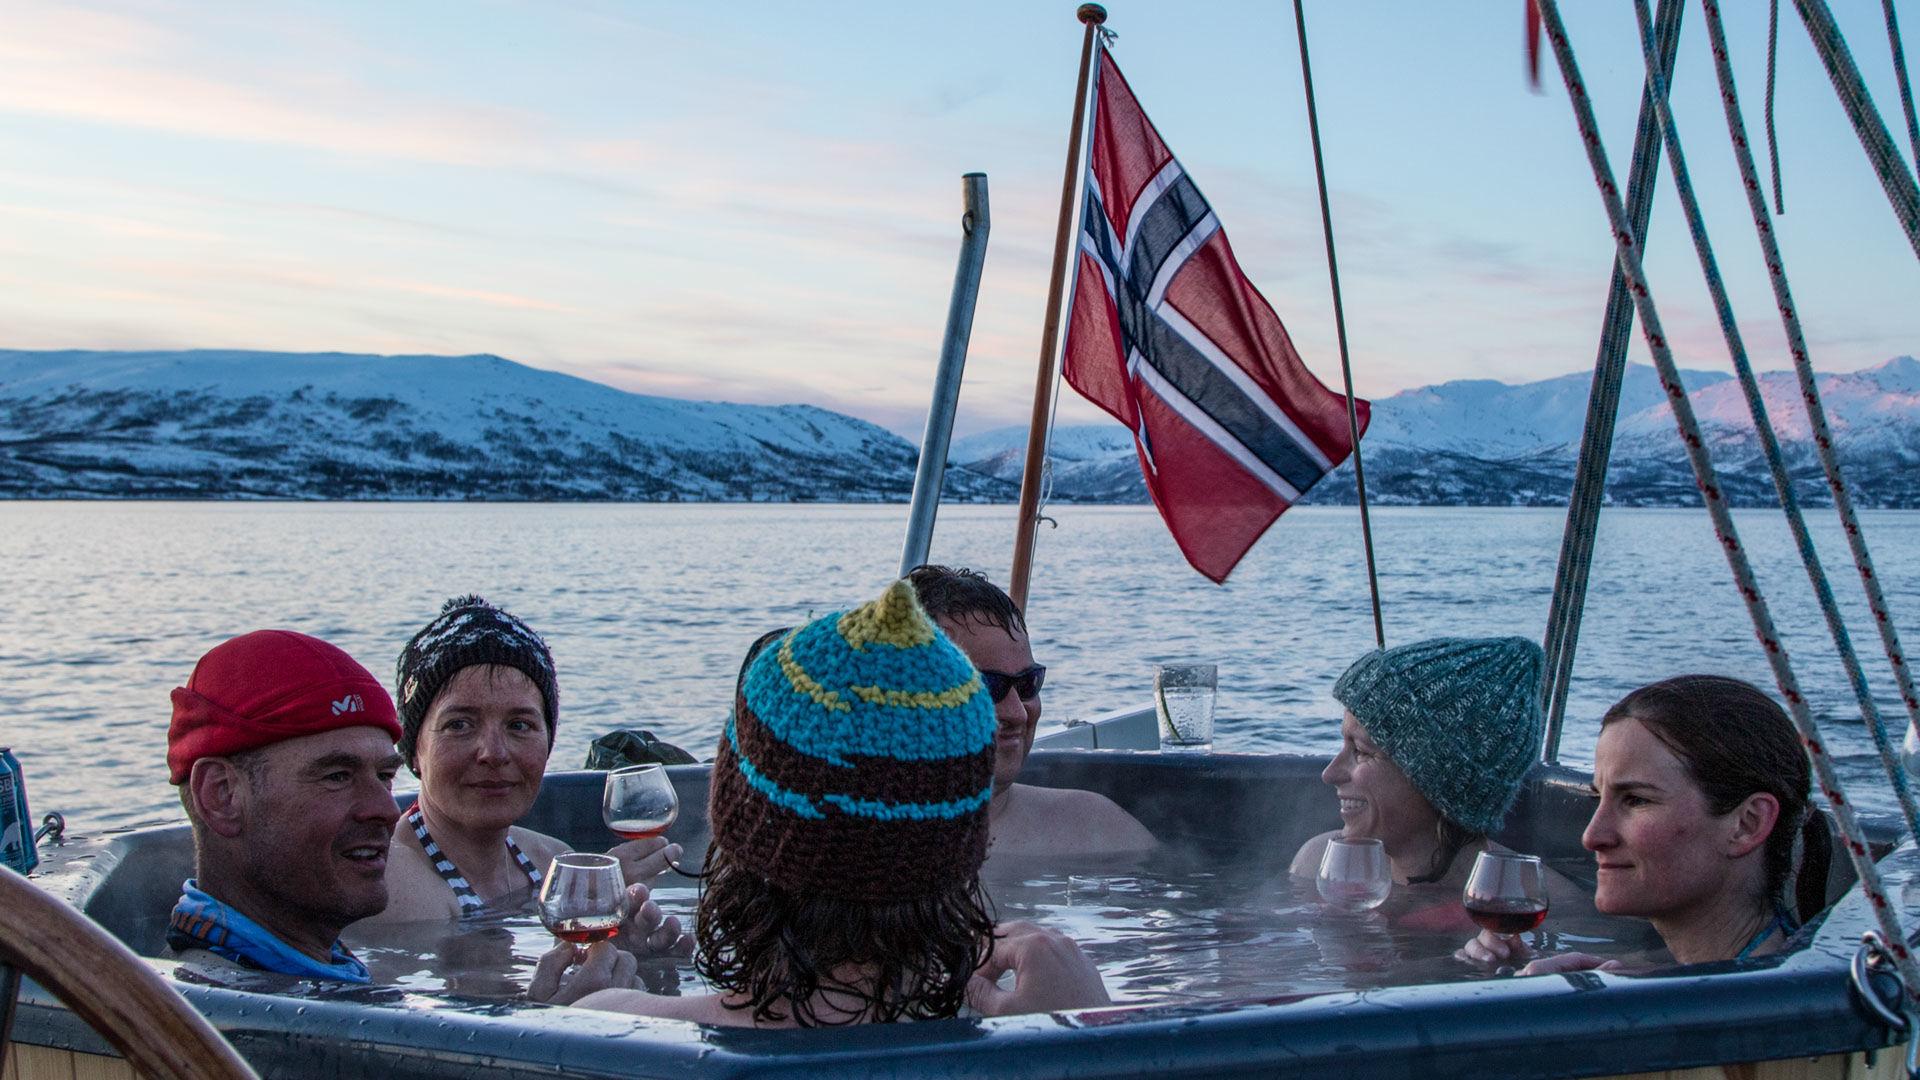 Im Hottub Auf Dem Schiff Im Lyngenfjord